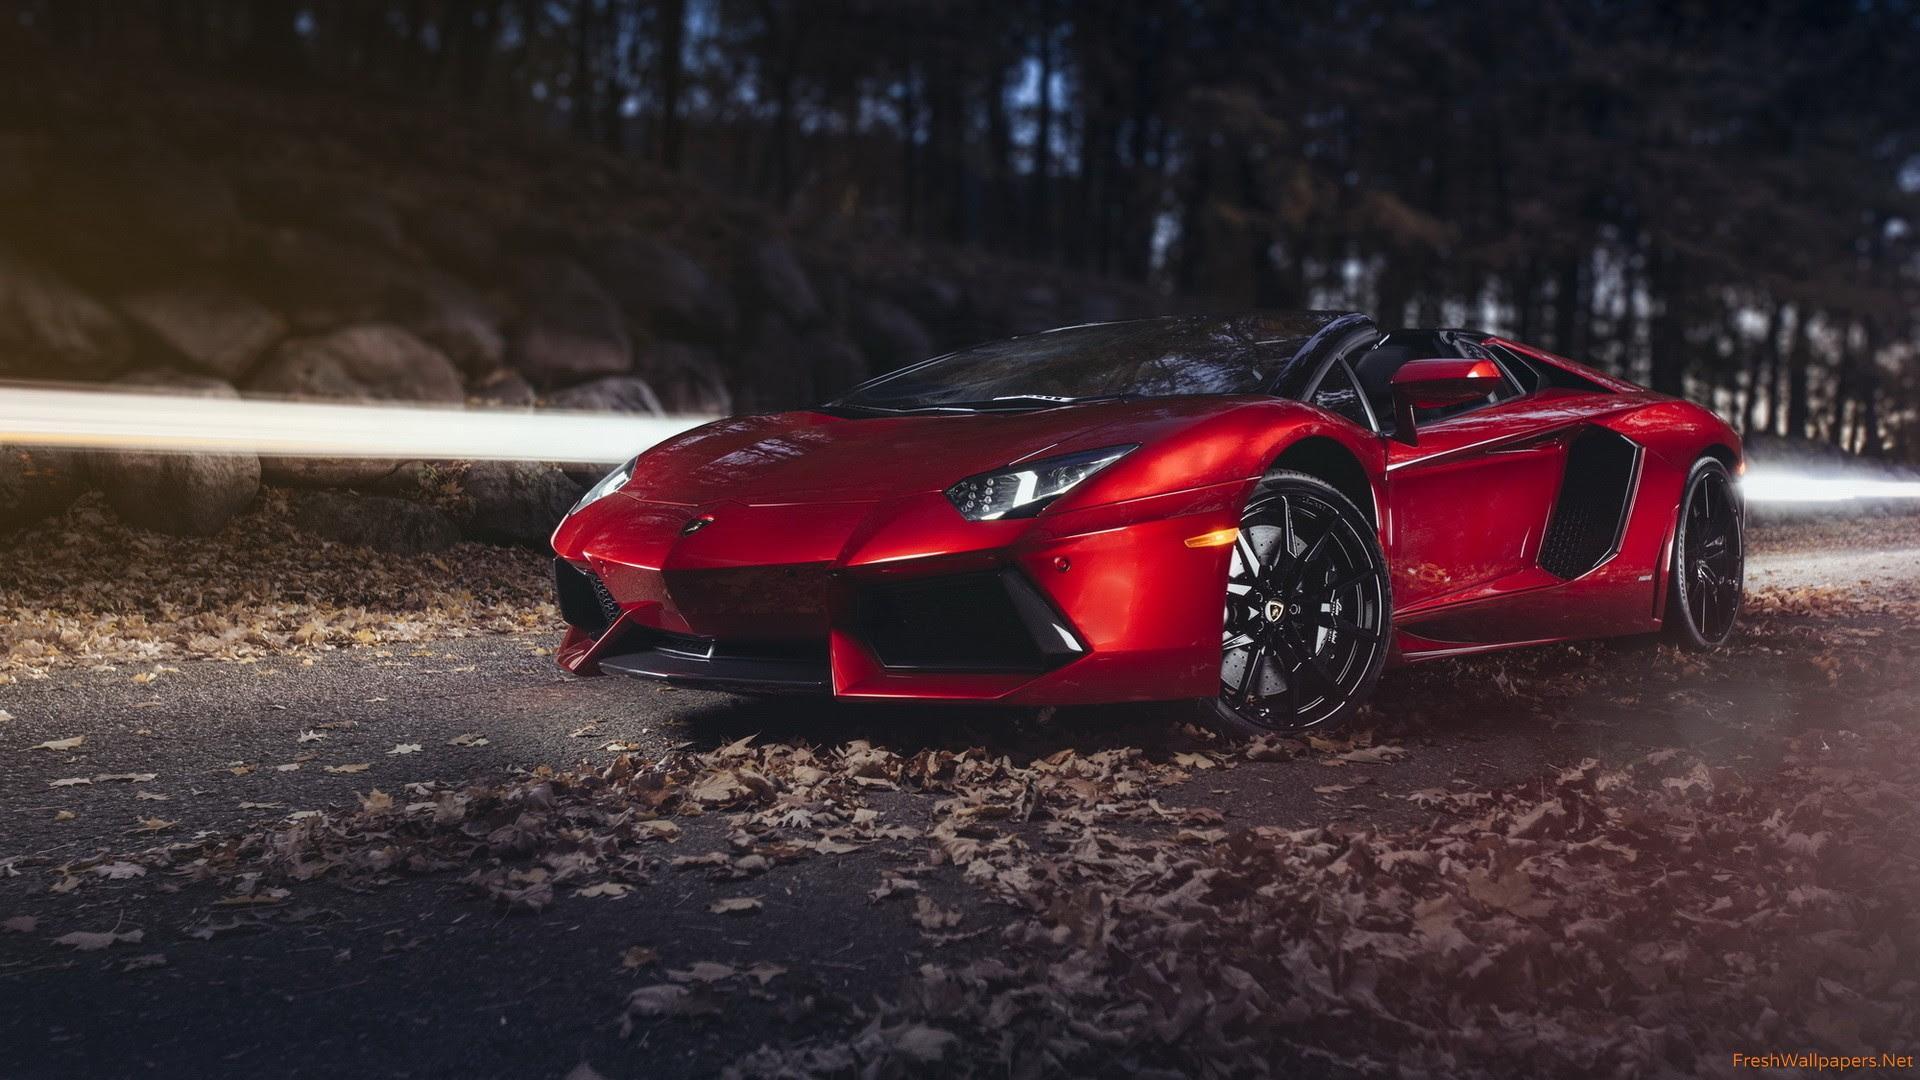 Lamborghini Aventador Roadster Hd Wallpaper 23569 Baltana